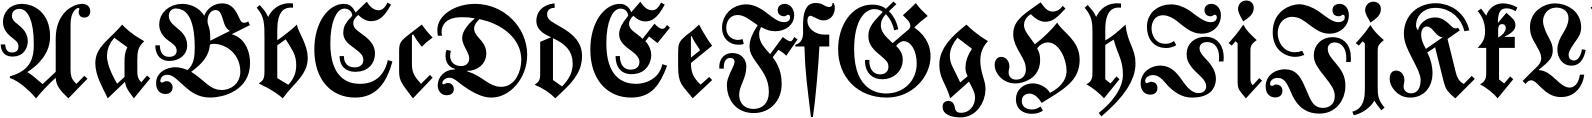 Fraktura